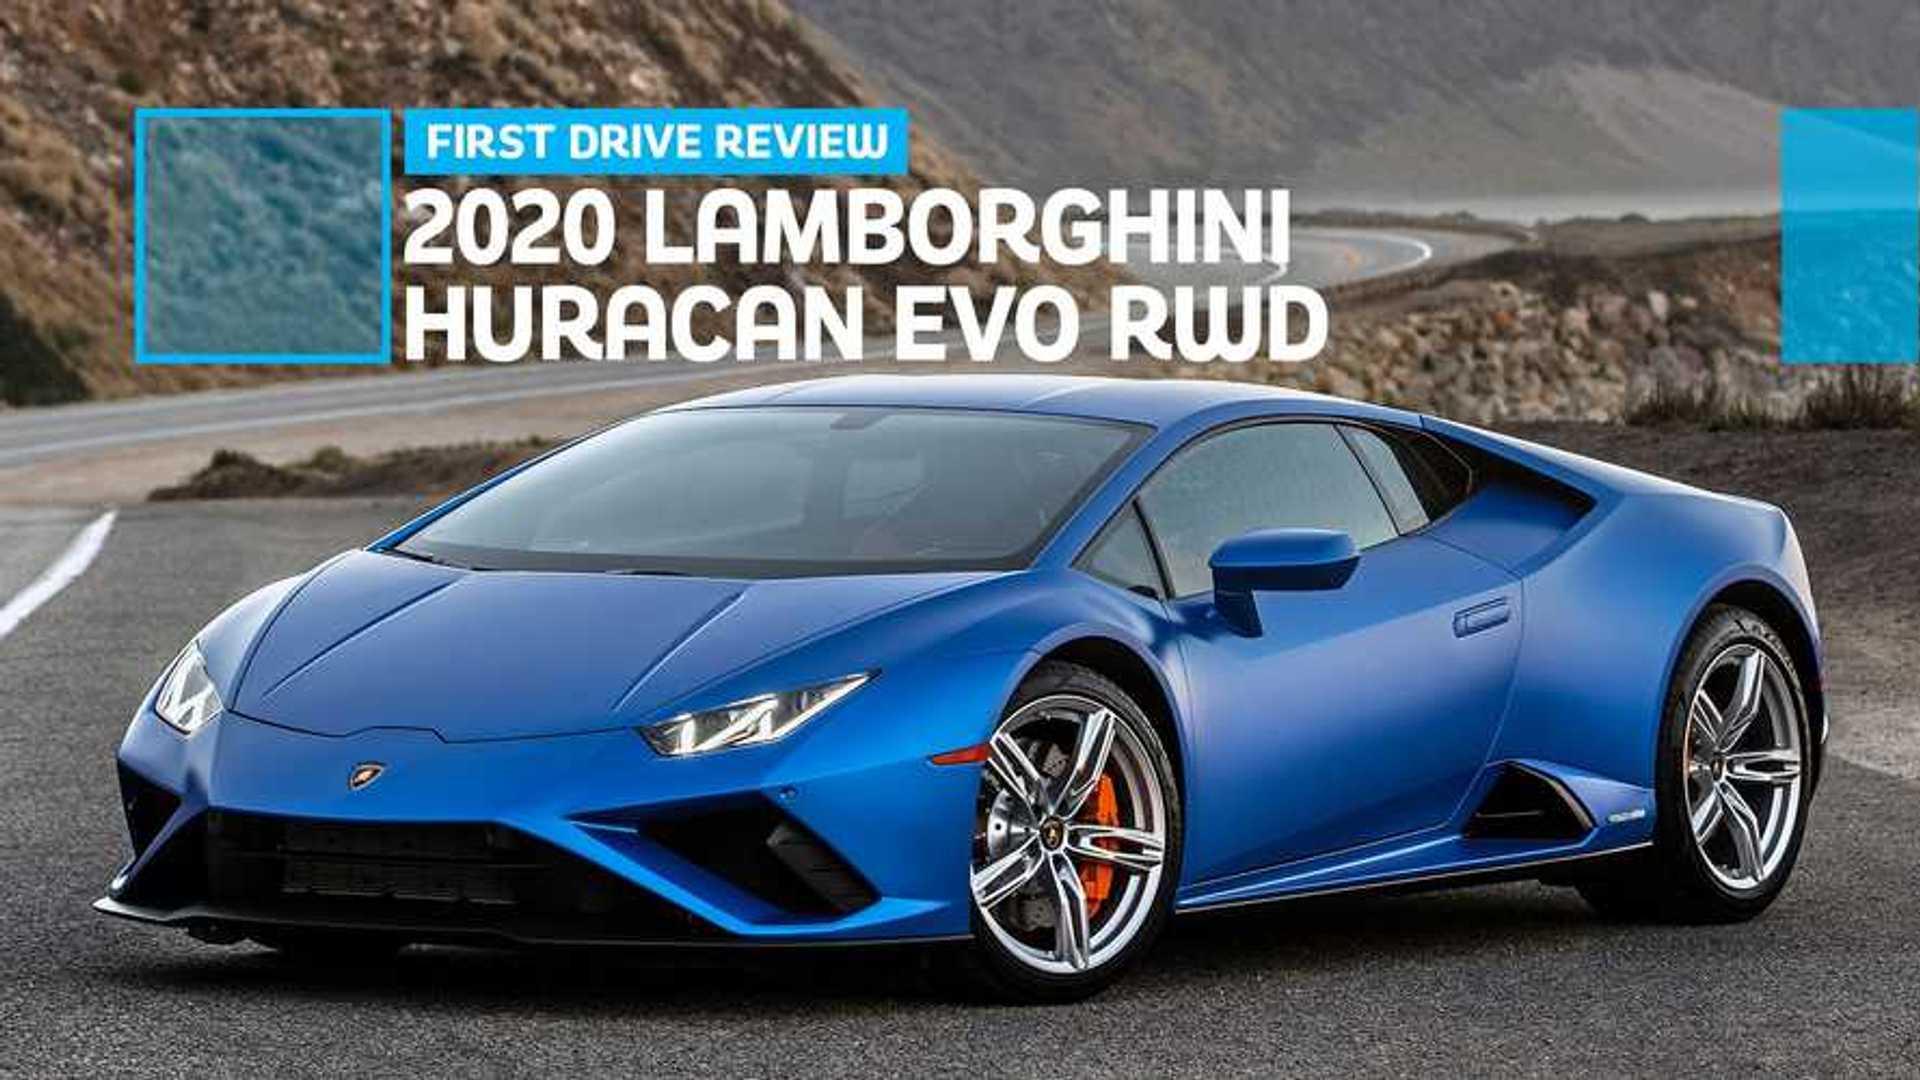 2020 Lamborghini Huracan Evo RWD First Drive Review: One Step Back, Two Steps Forward